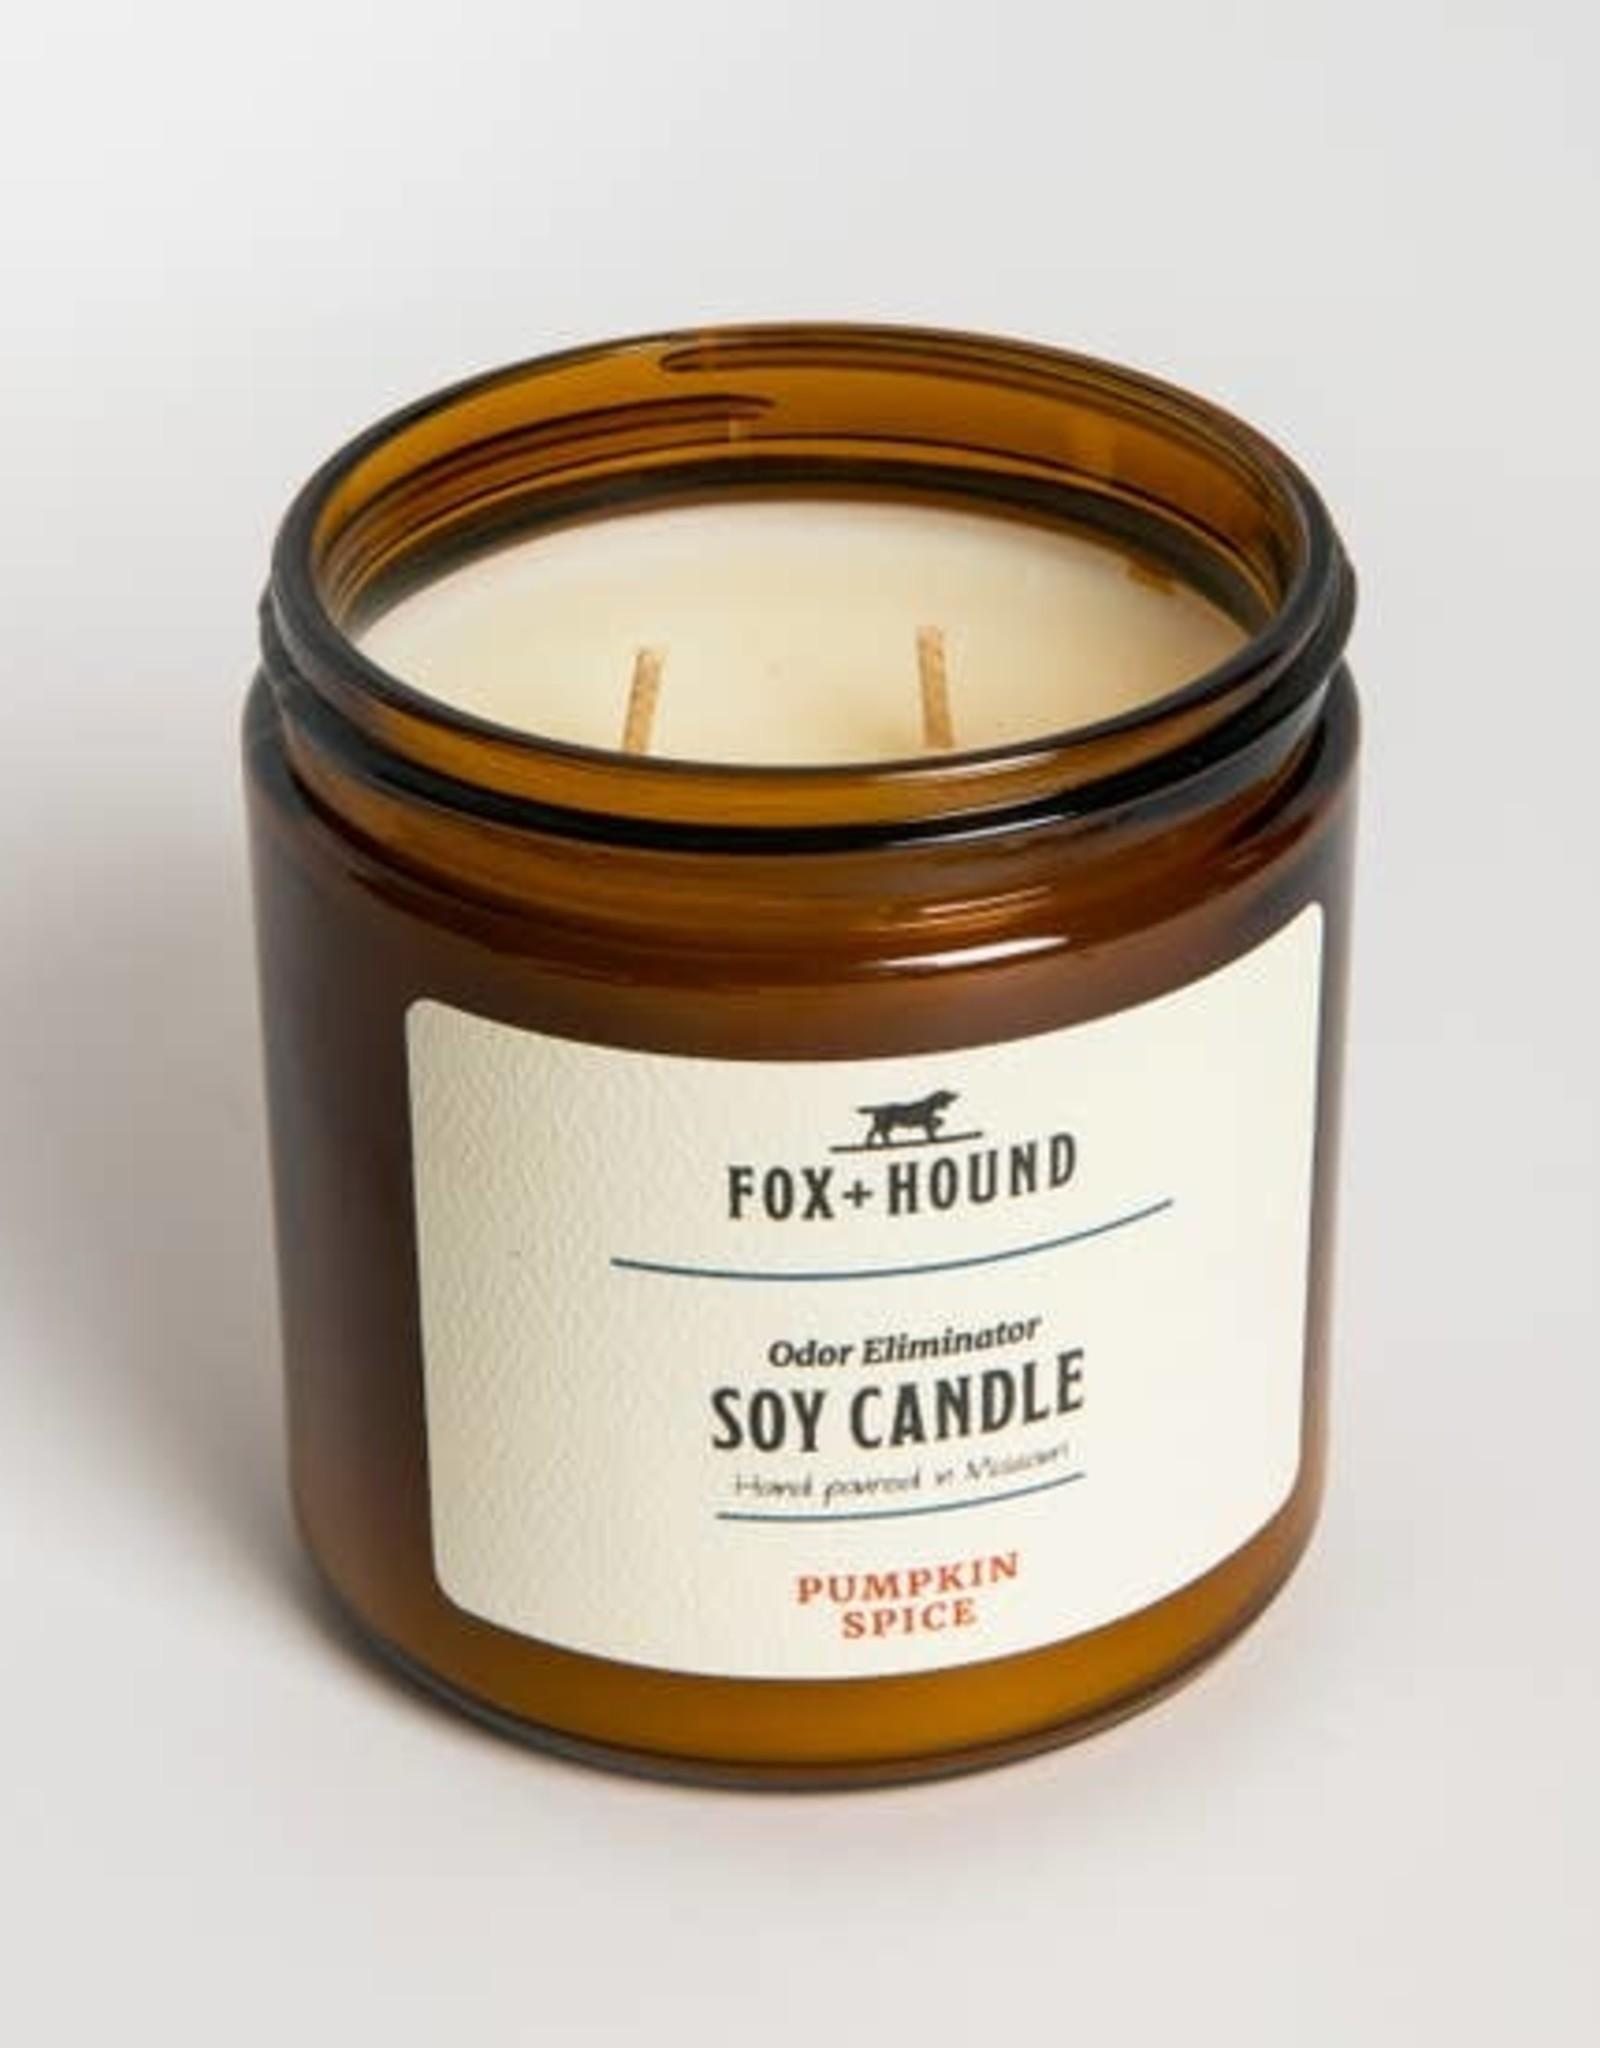 Fox & Hound Odor Eliminator Soy Candle - Pumpkin Spice